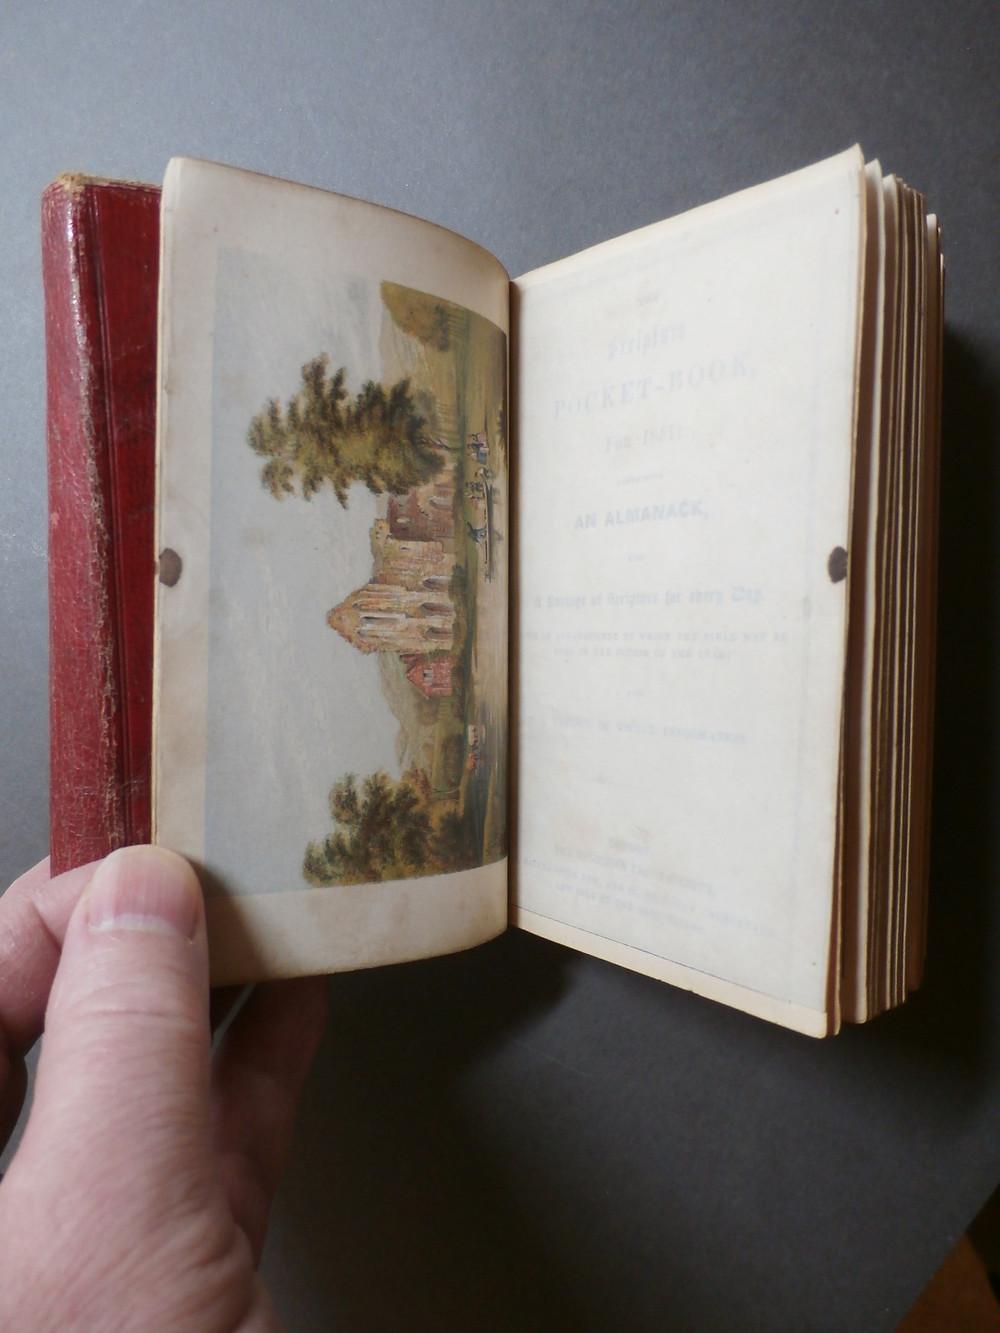 Scripture Pocket Book 1851 - Baxter Print - Crucis Abbey